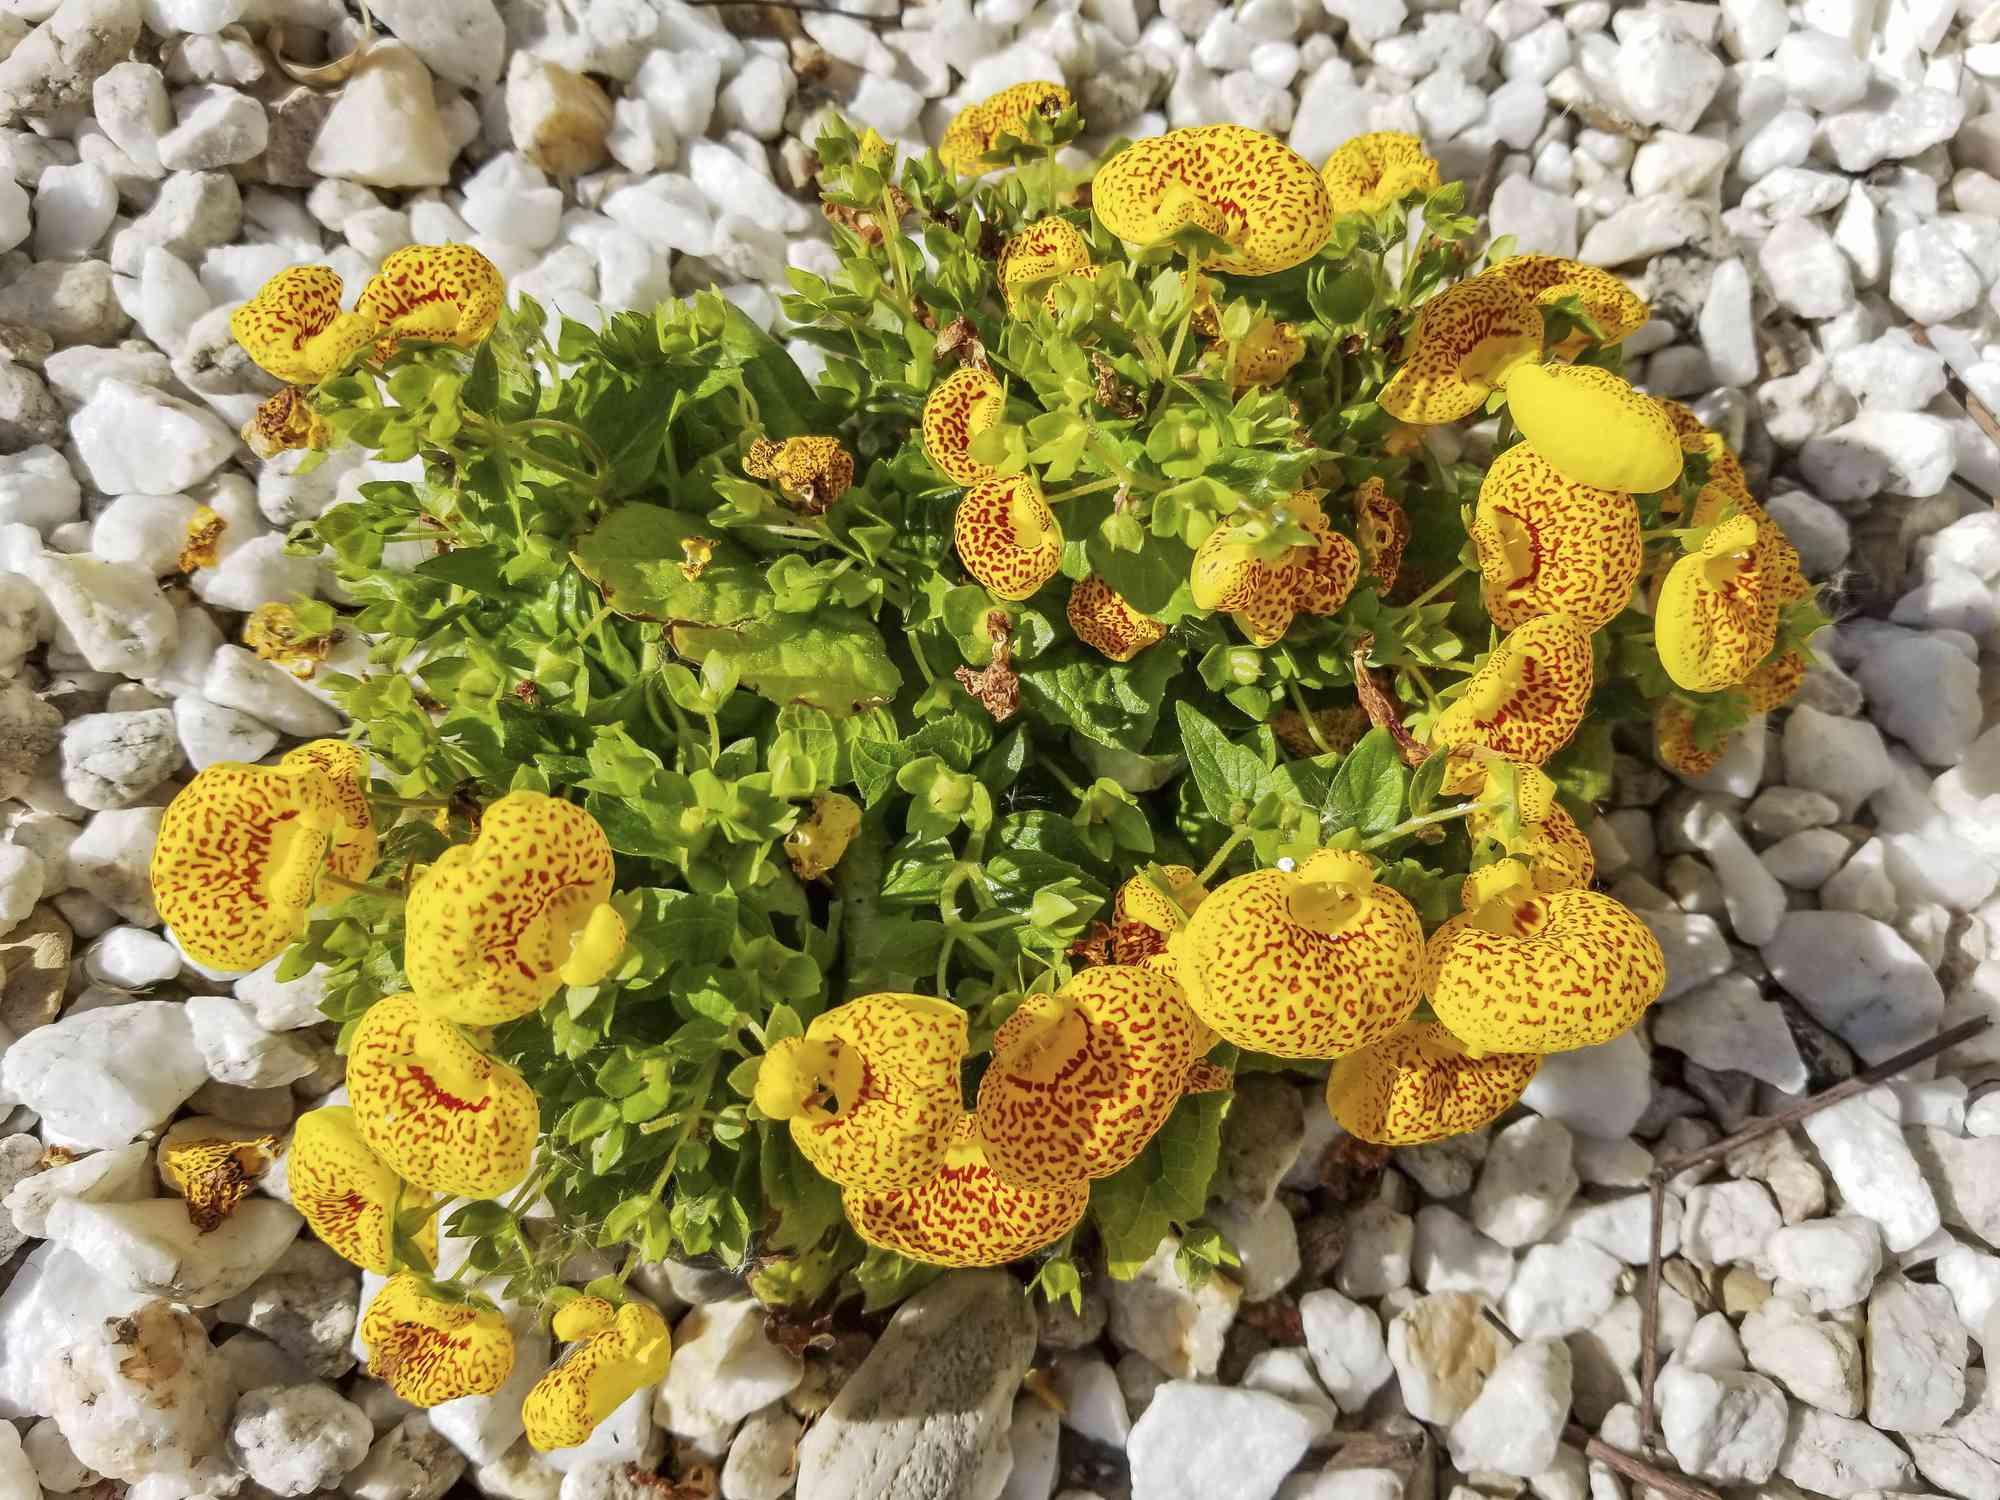 Calceolaria integrifolia on a bed of pebbles